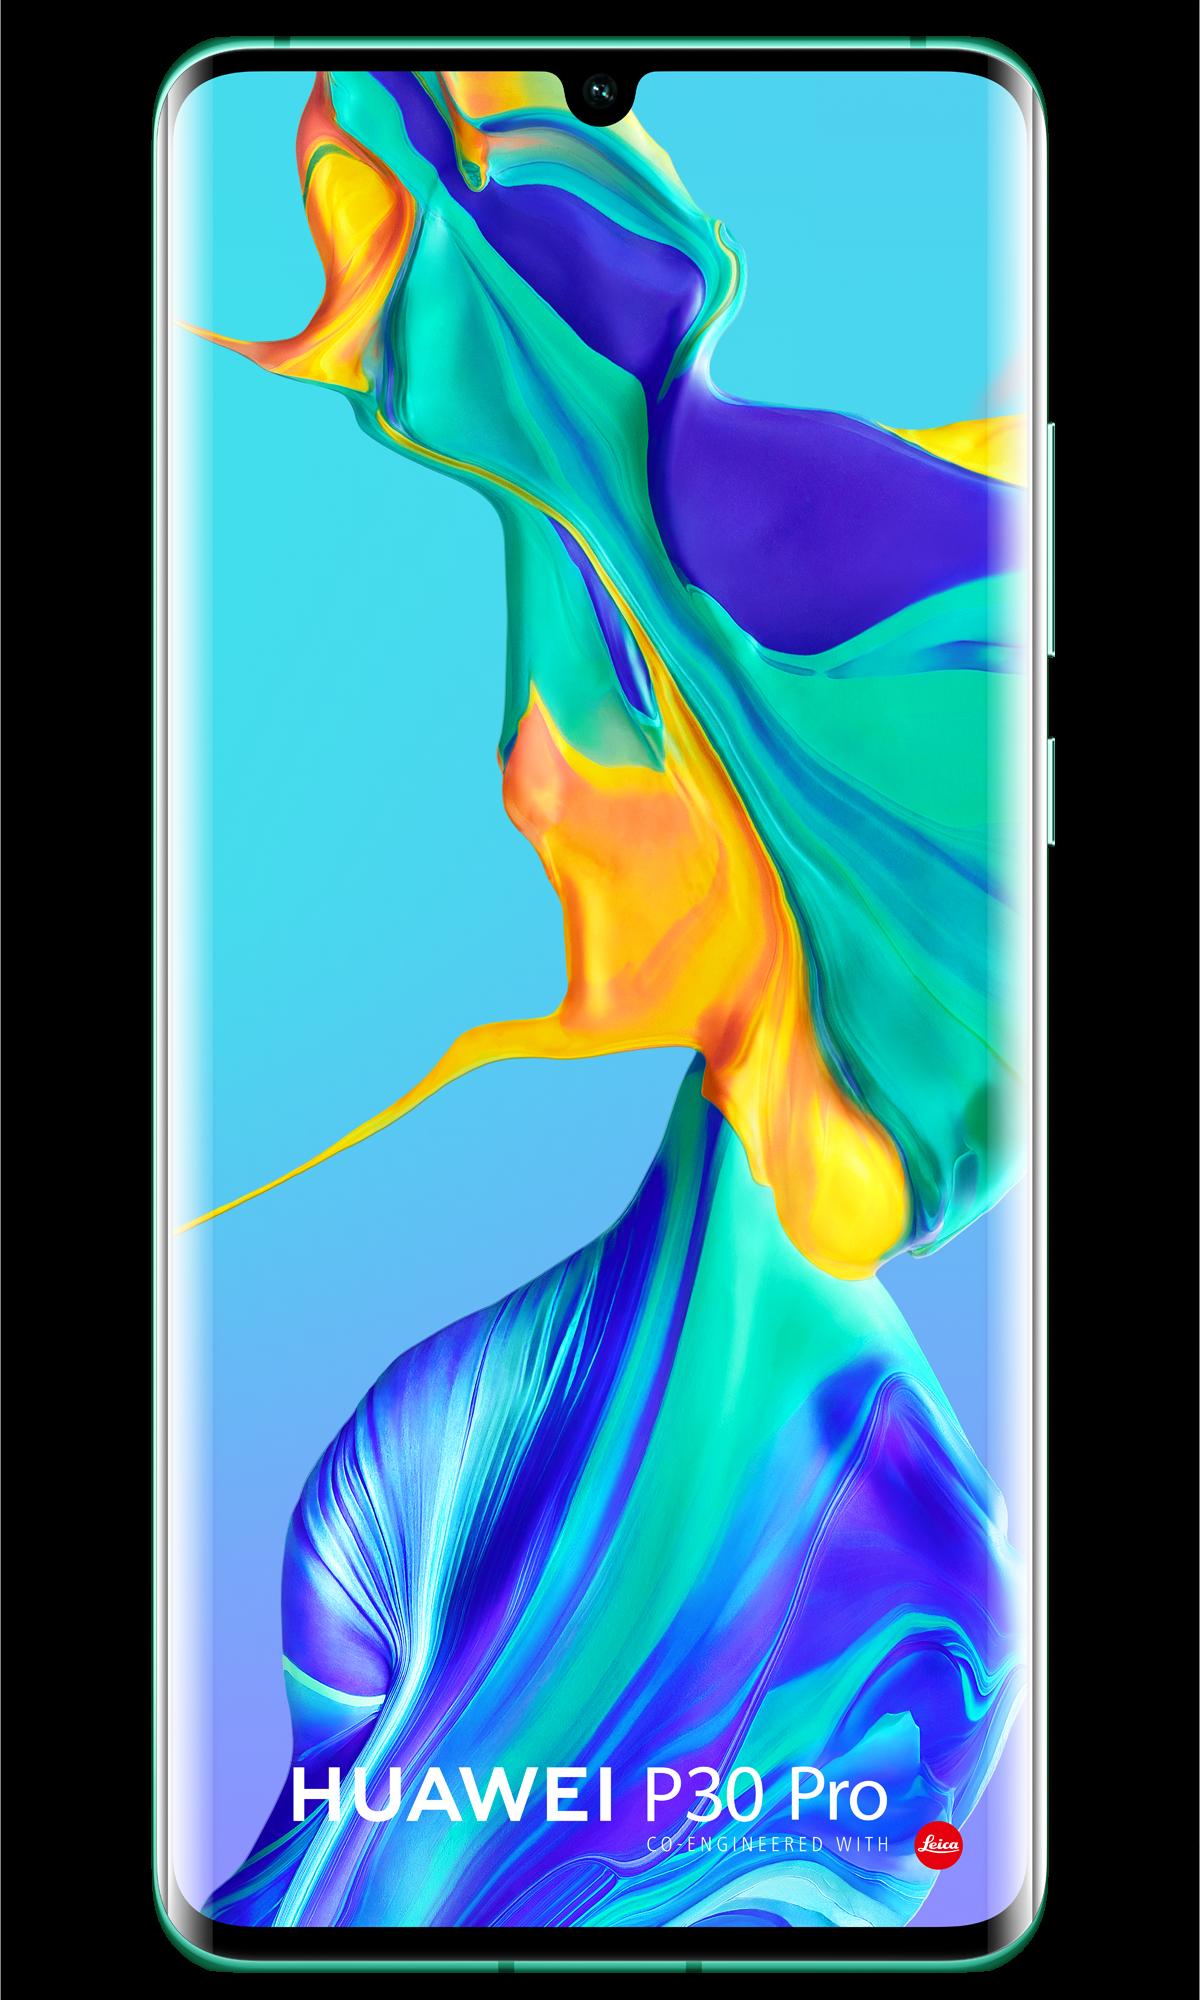 Huawei P30 Pro smartphone